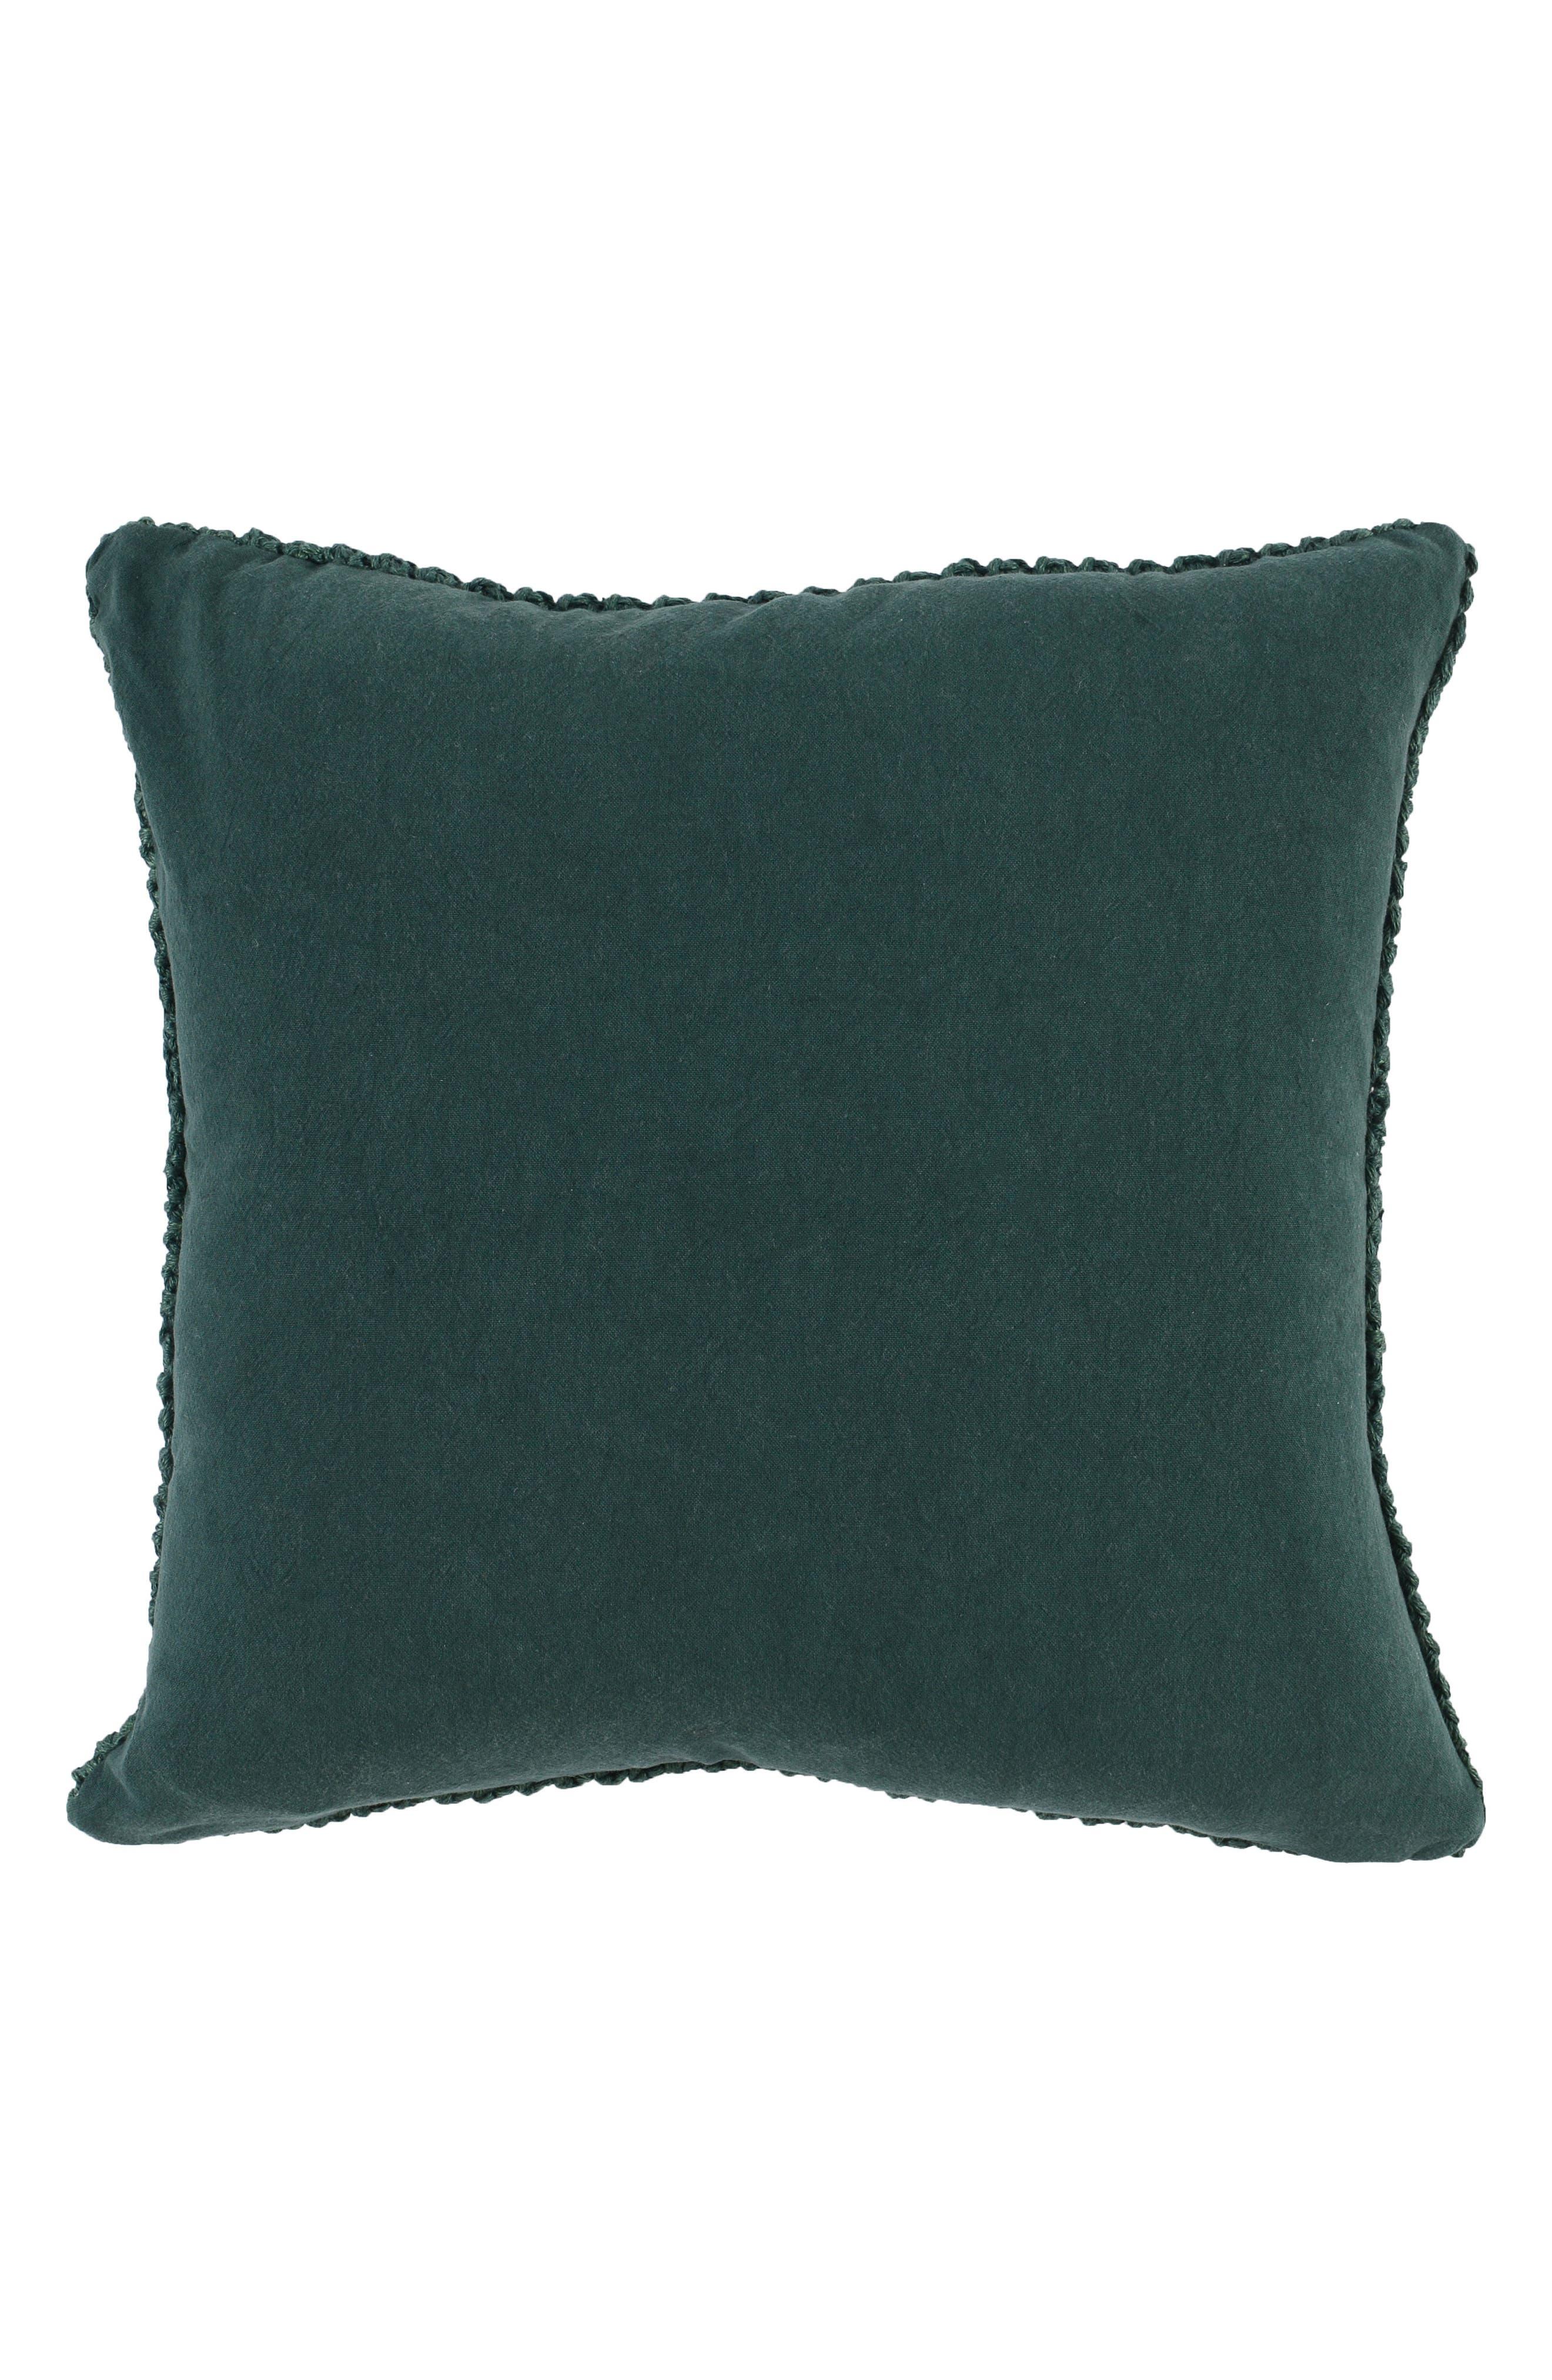 Nita Accent Pillow,                             Alternate thumbnail 2, color,                             Emerald Green